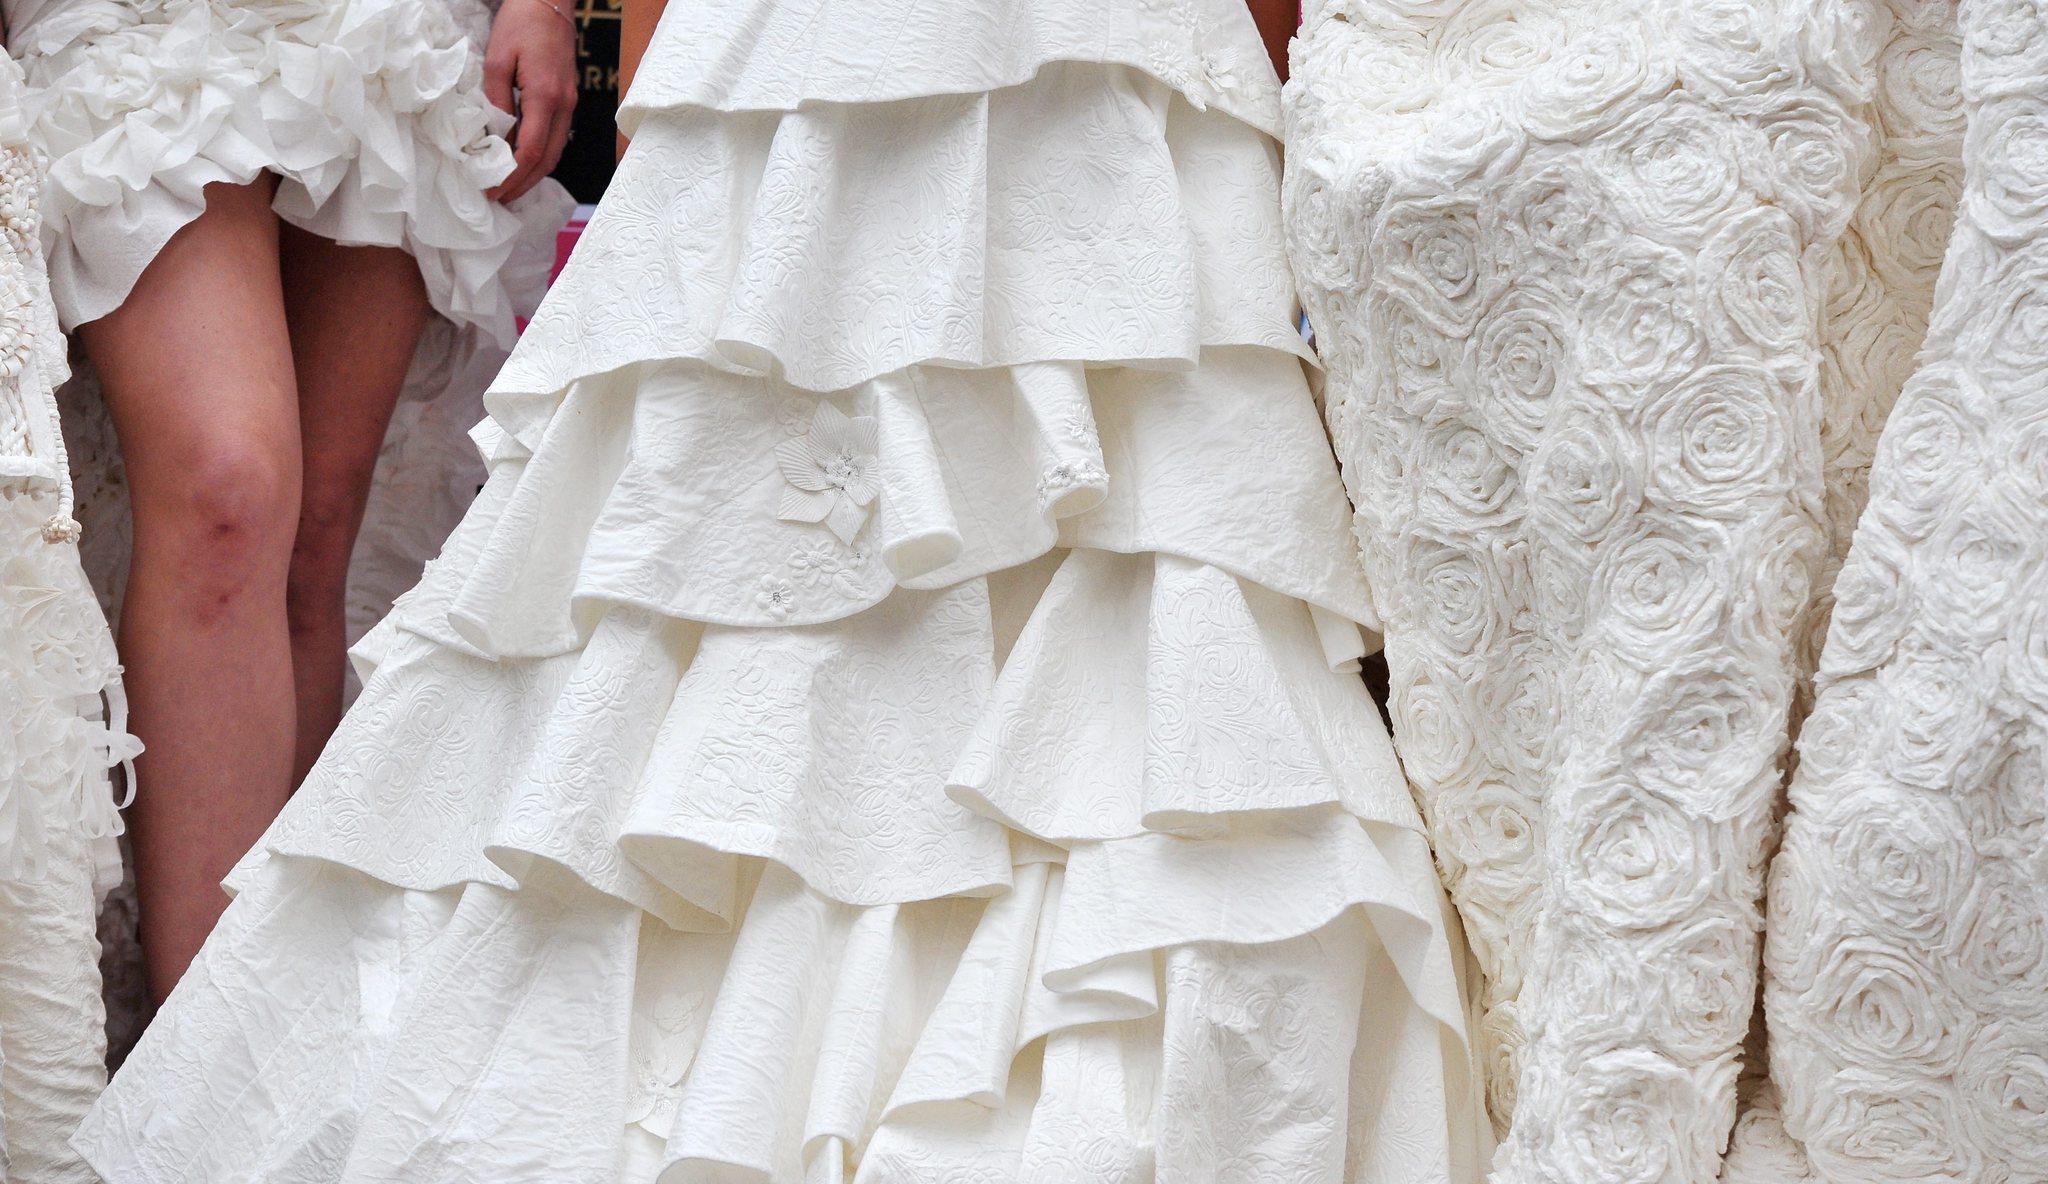 Toilet paper wedding dress chicago tribune for Toilet paper wedding dress 2017